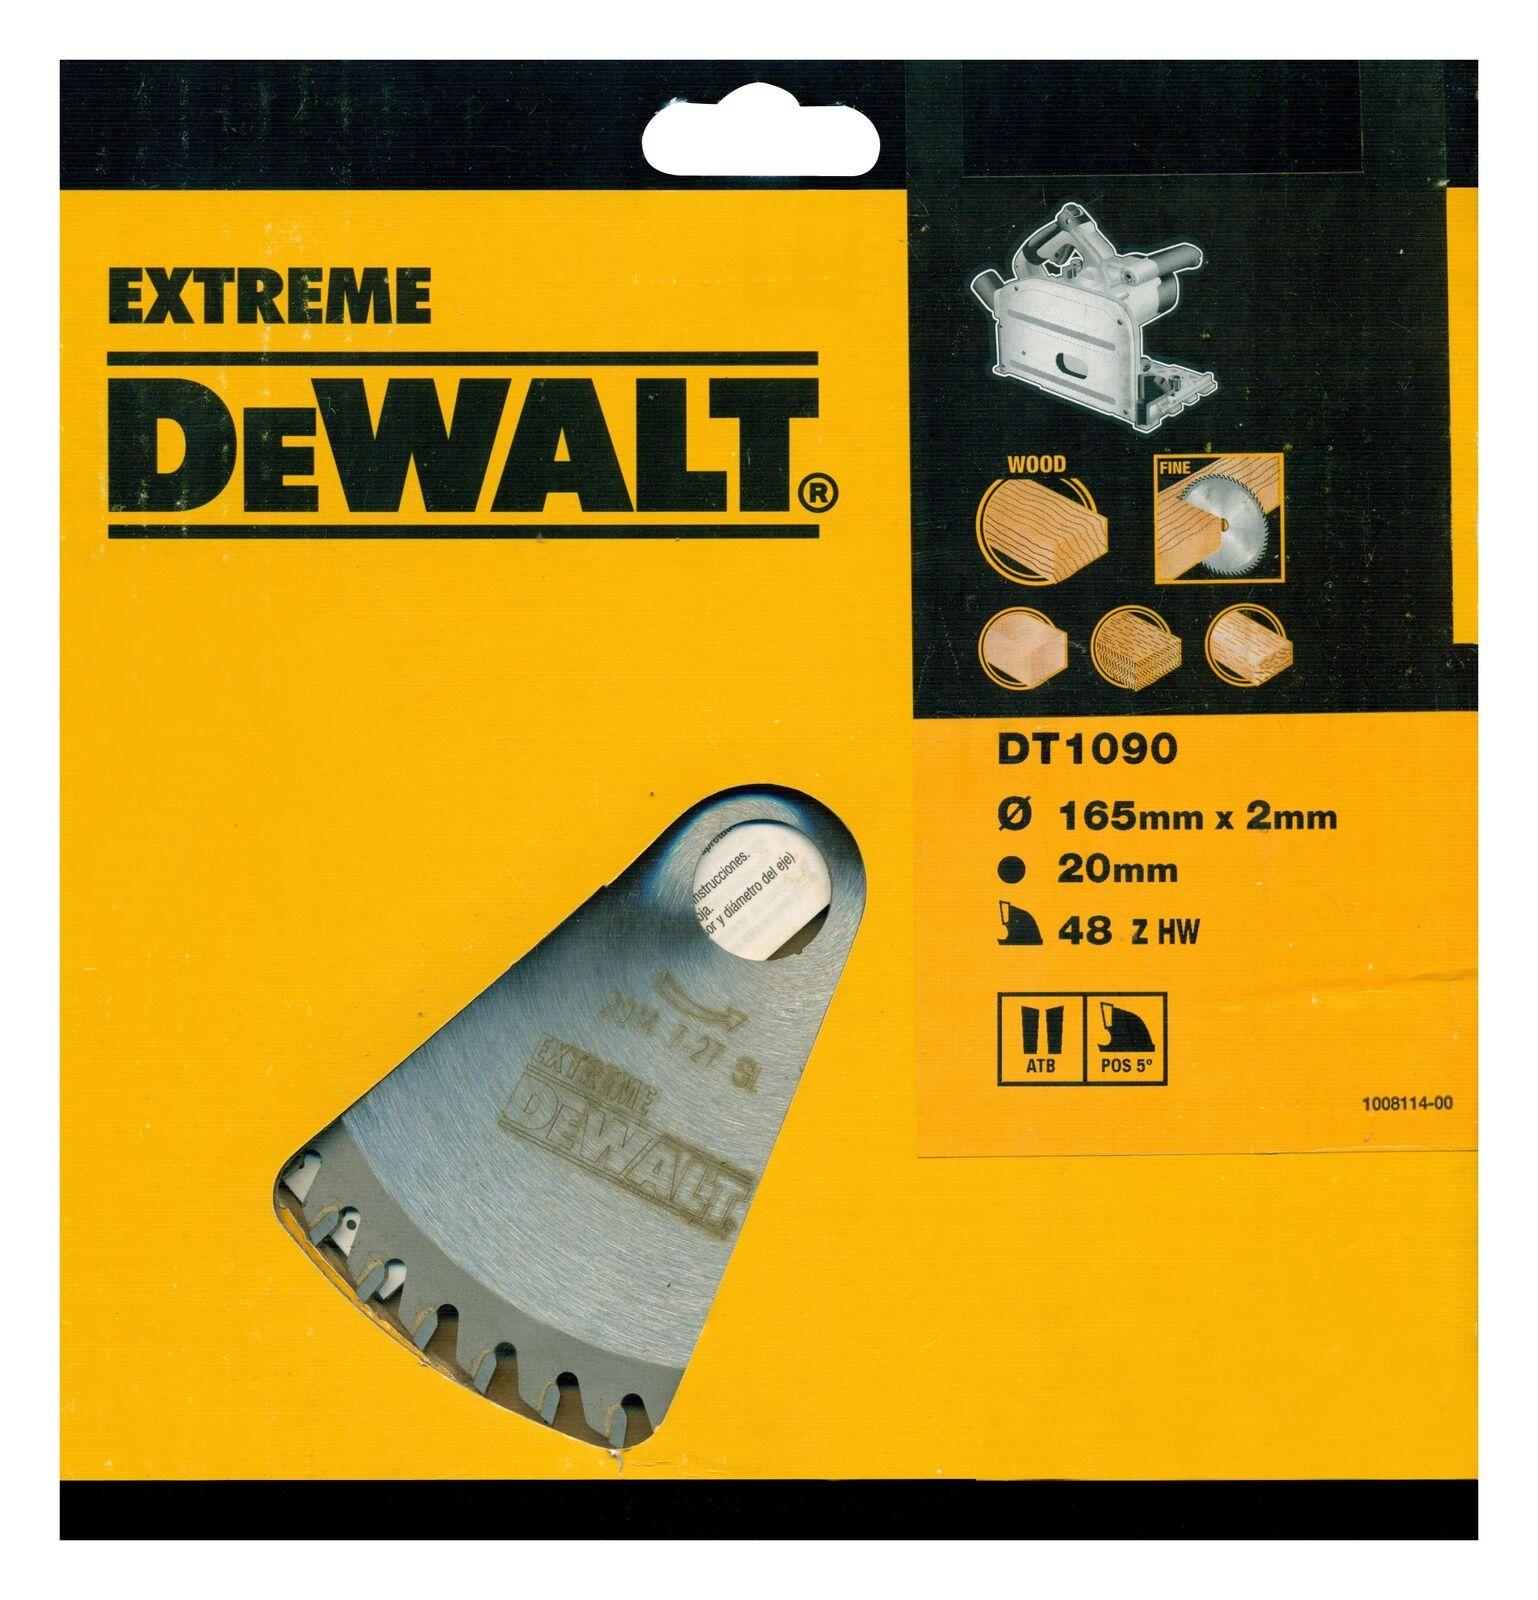 DeWalt Extreme Tauchkreissägeblatt DT1090 Holz Sägeblatt Ø165mm Kappsäge